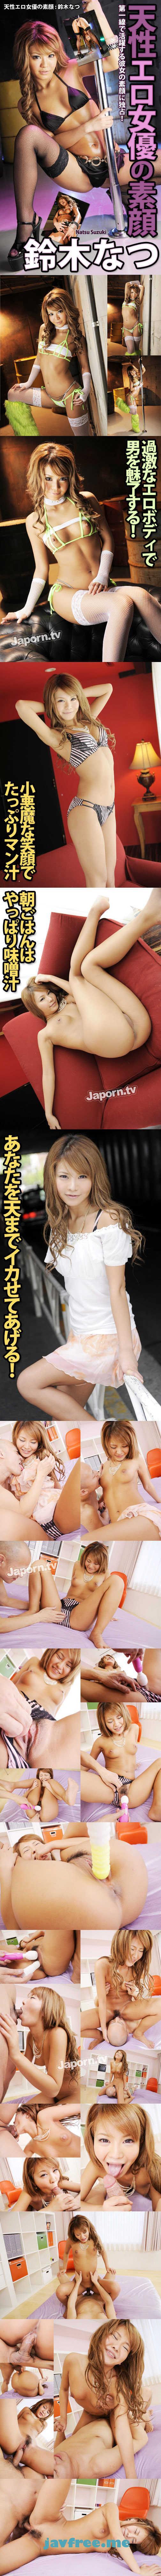 [PT 120] 天性エロ女優の素顔 : 鈴木なつ 鈴木なつ PT Natsu Suzuki